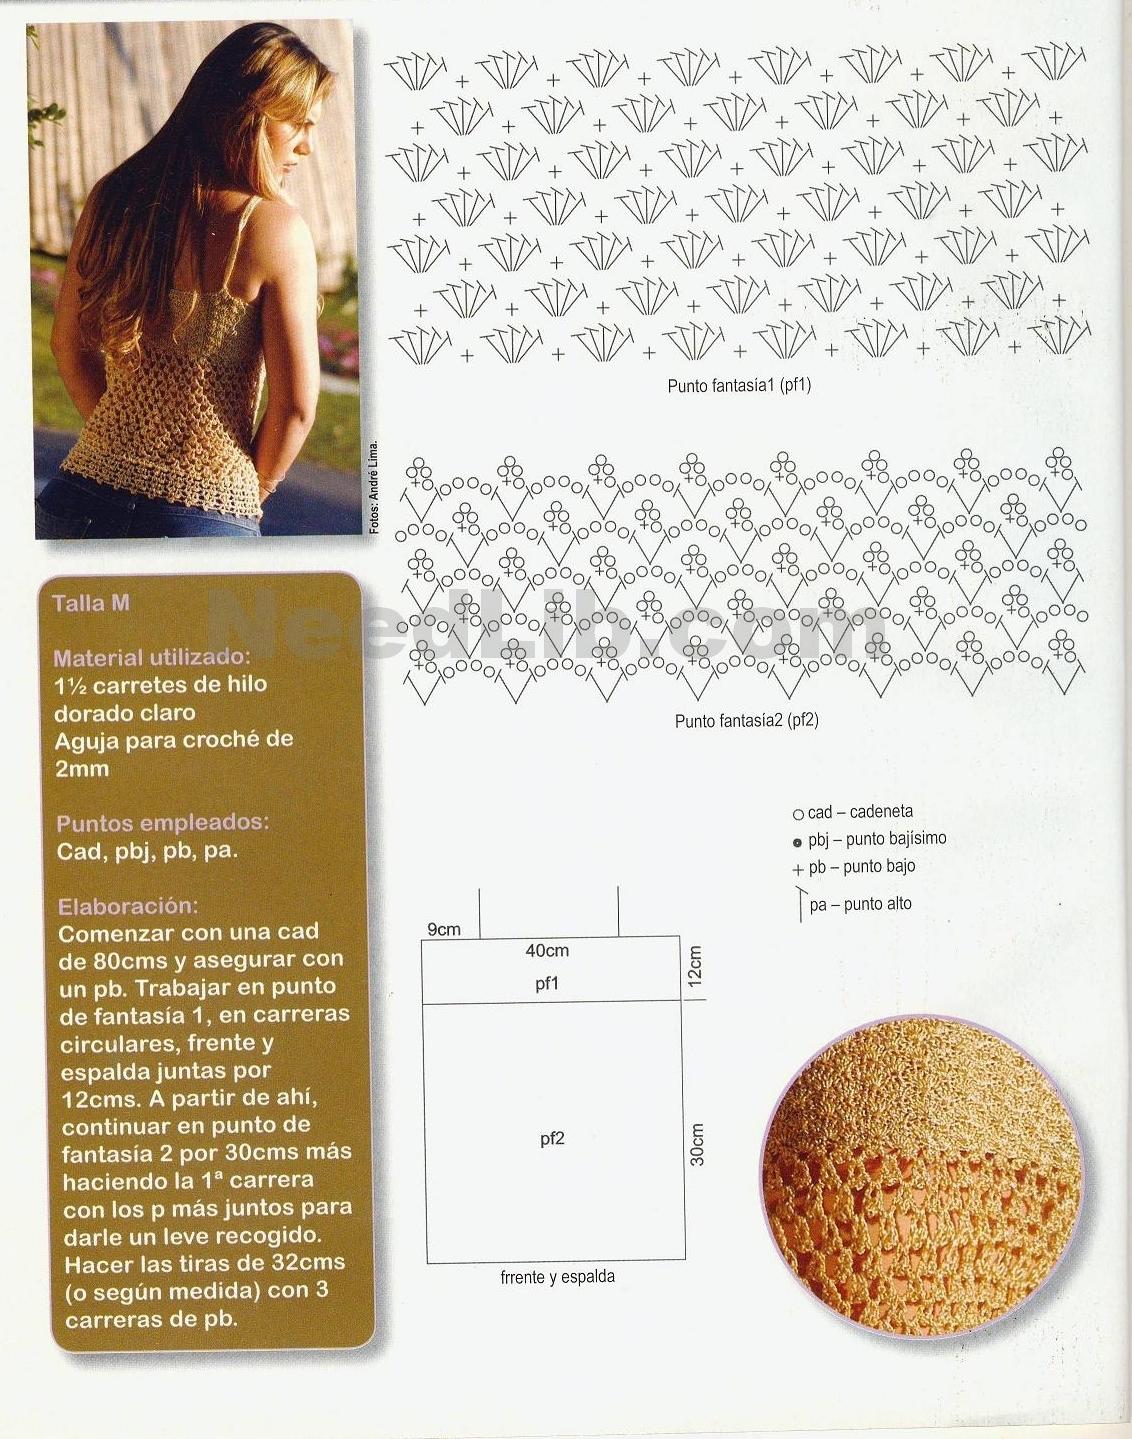 0840_Ganchillo y crochet ano 3 nro 22 (35)